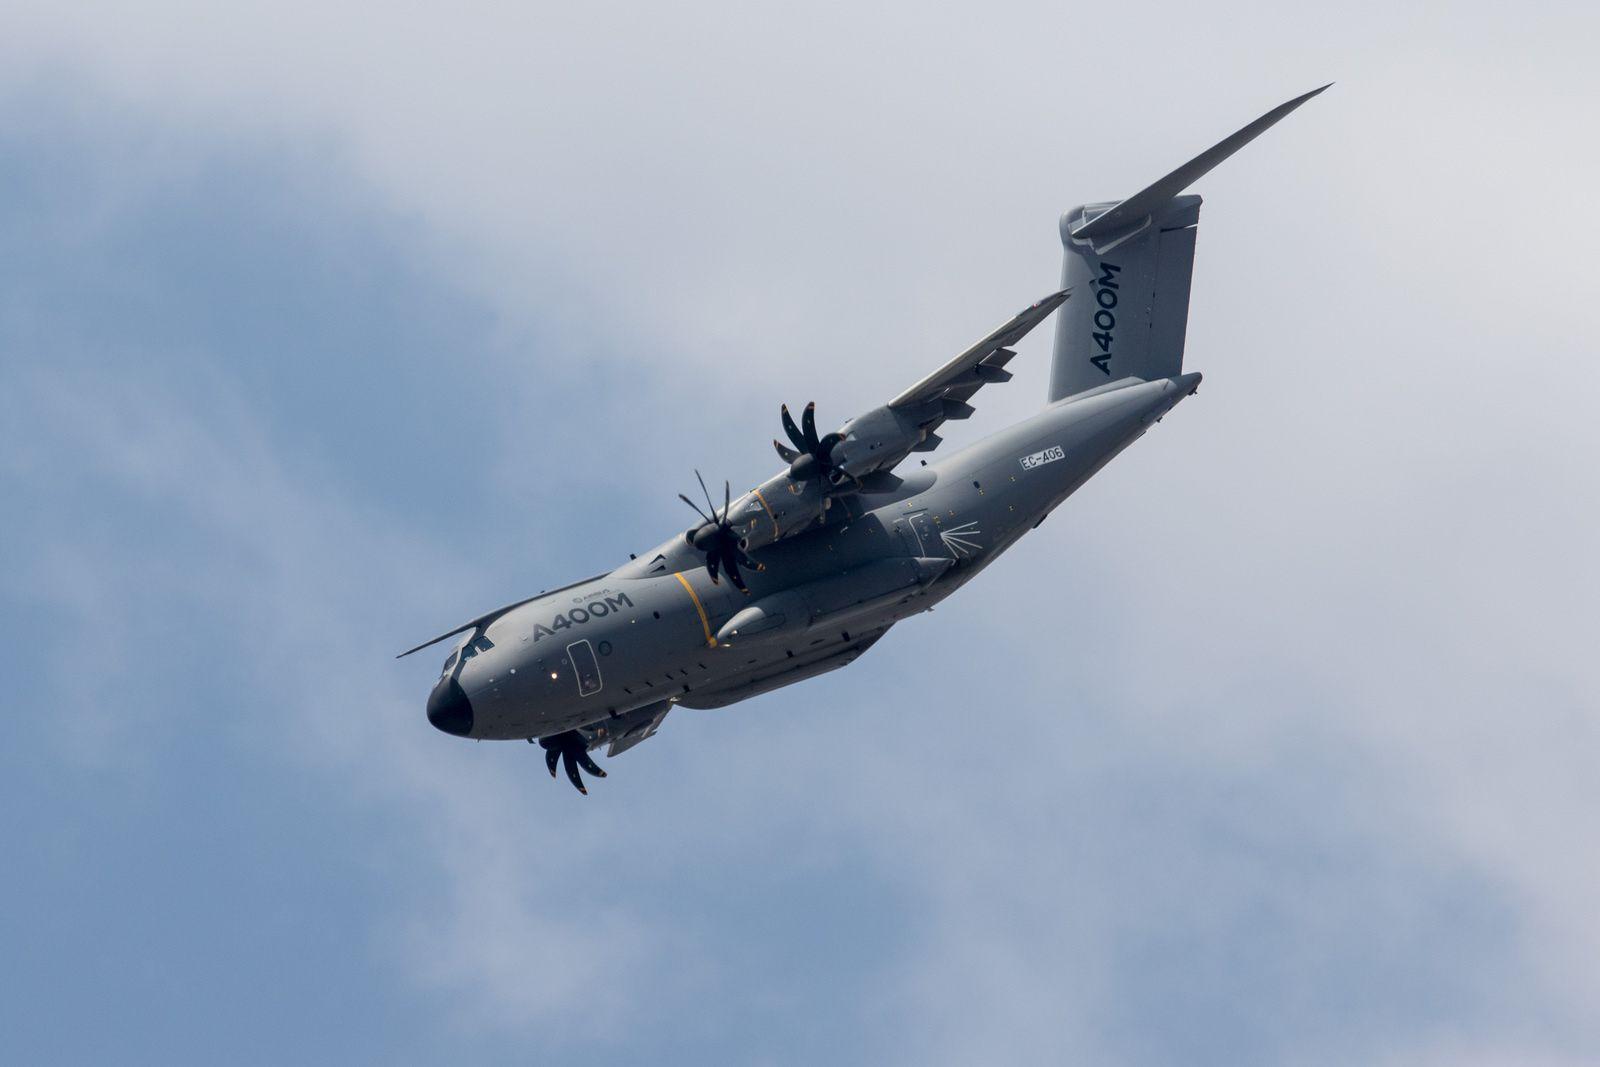 L'avion Airbus A 400 M